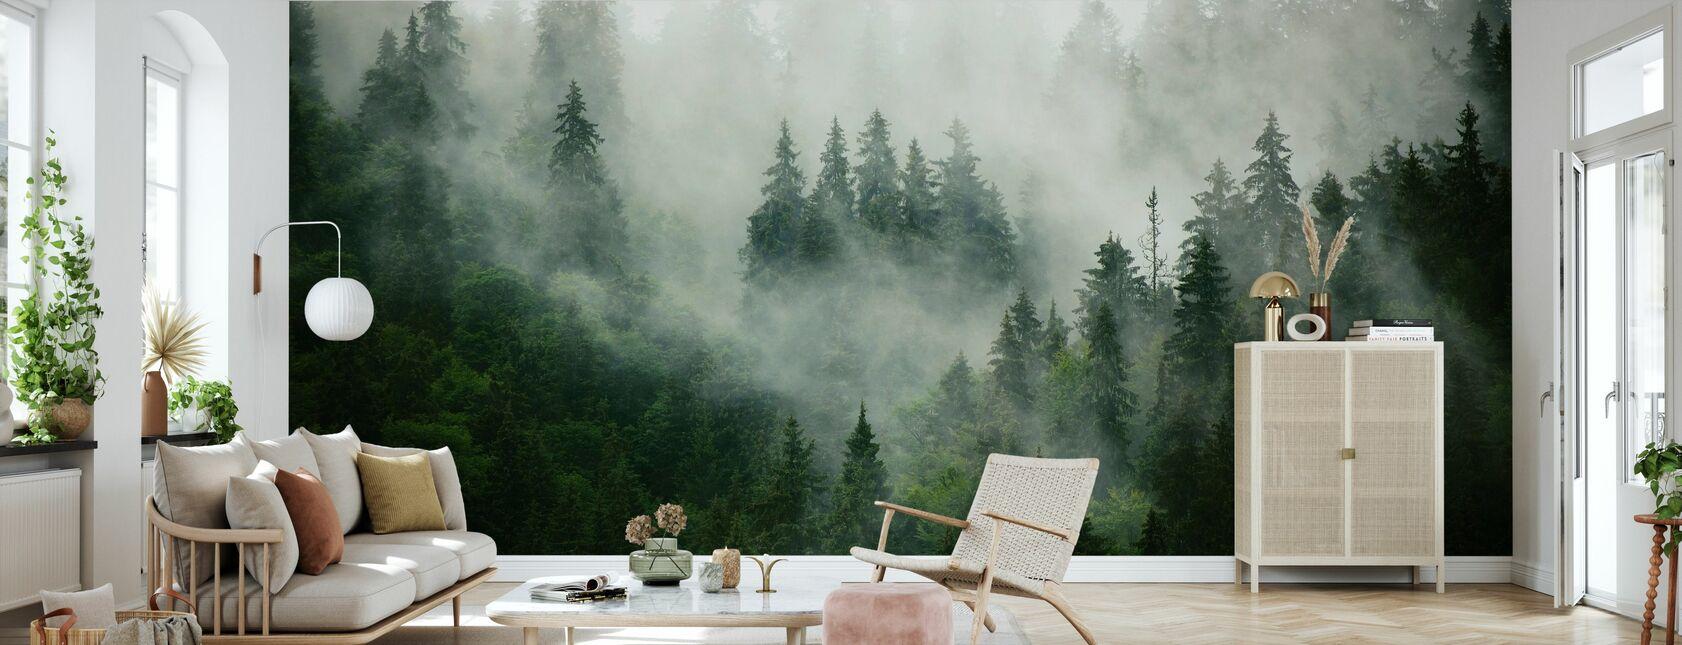 Foggy Forest - Wallpaper - Living Room